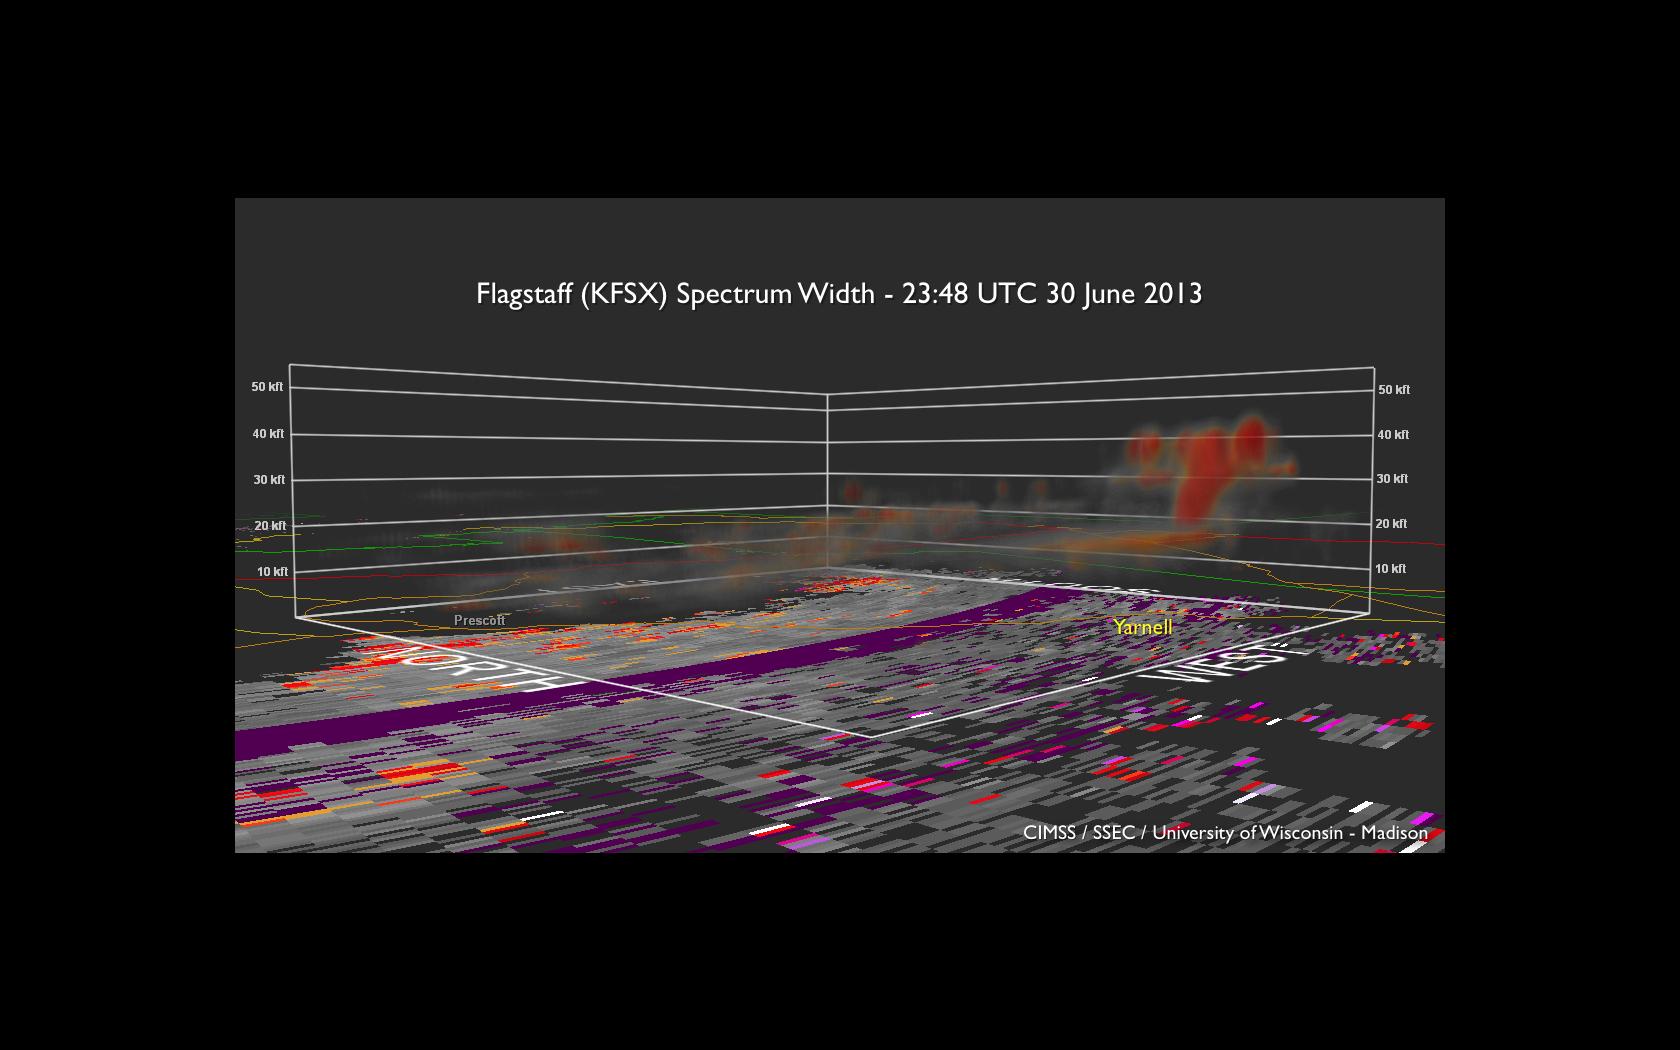 Flagstaff, Arizona WSR-88D radar spectrum width (click image to play animation)